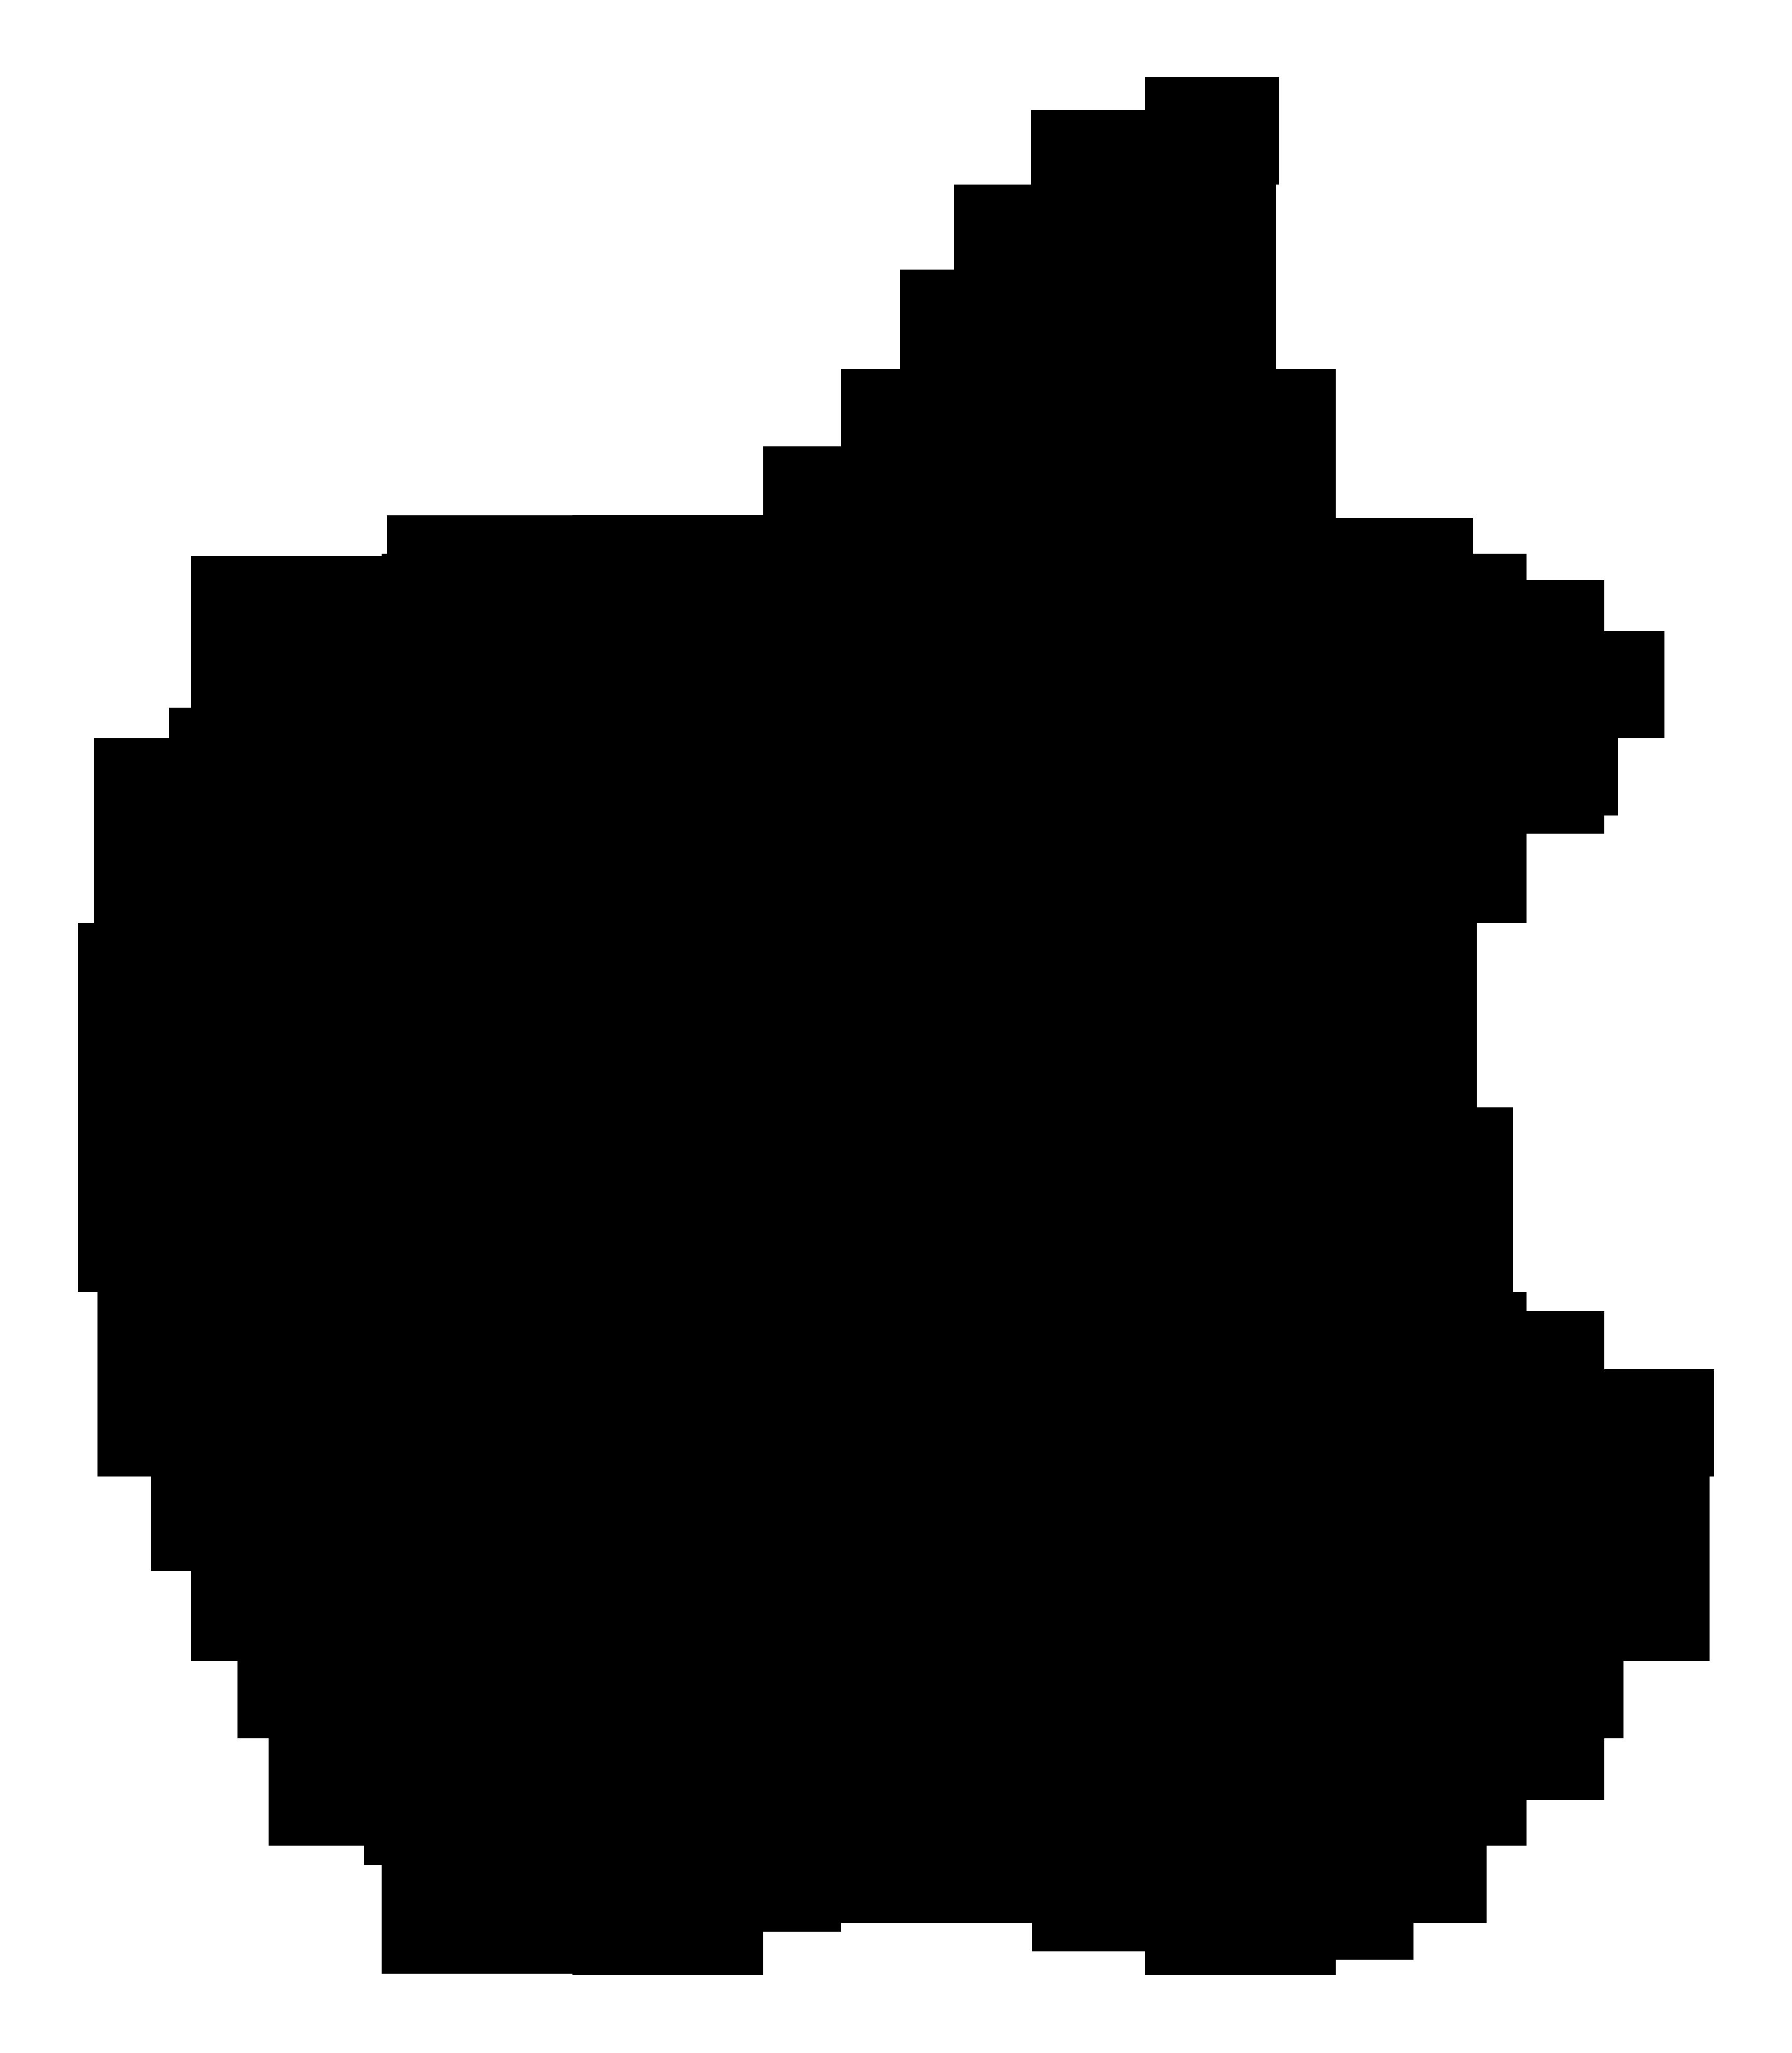 Apple Logo PNG Image - PurePNG | Free transparent CC0 PNG ... - Apple Logo ClipArt